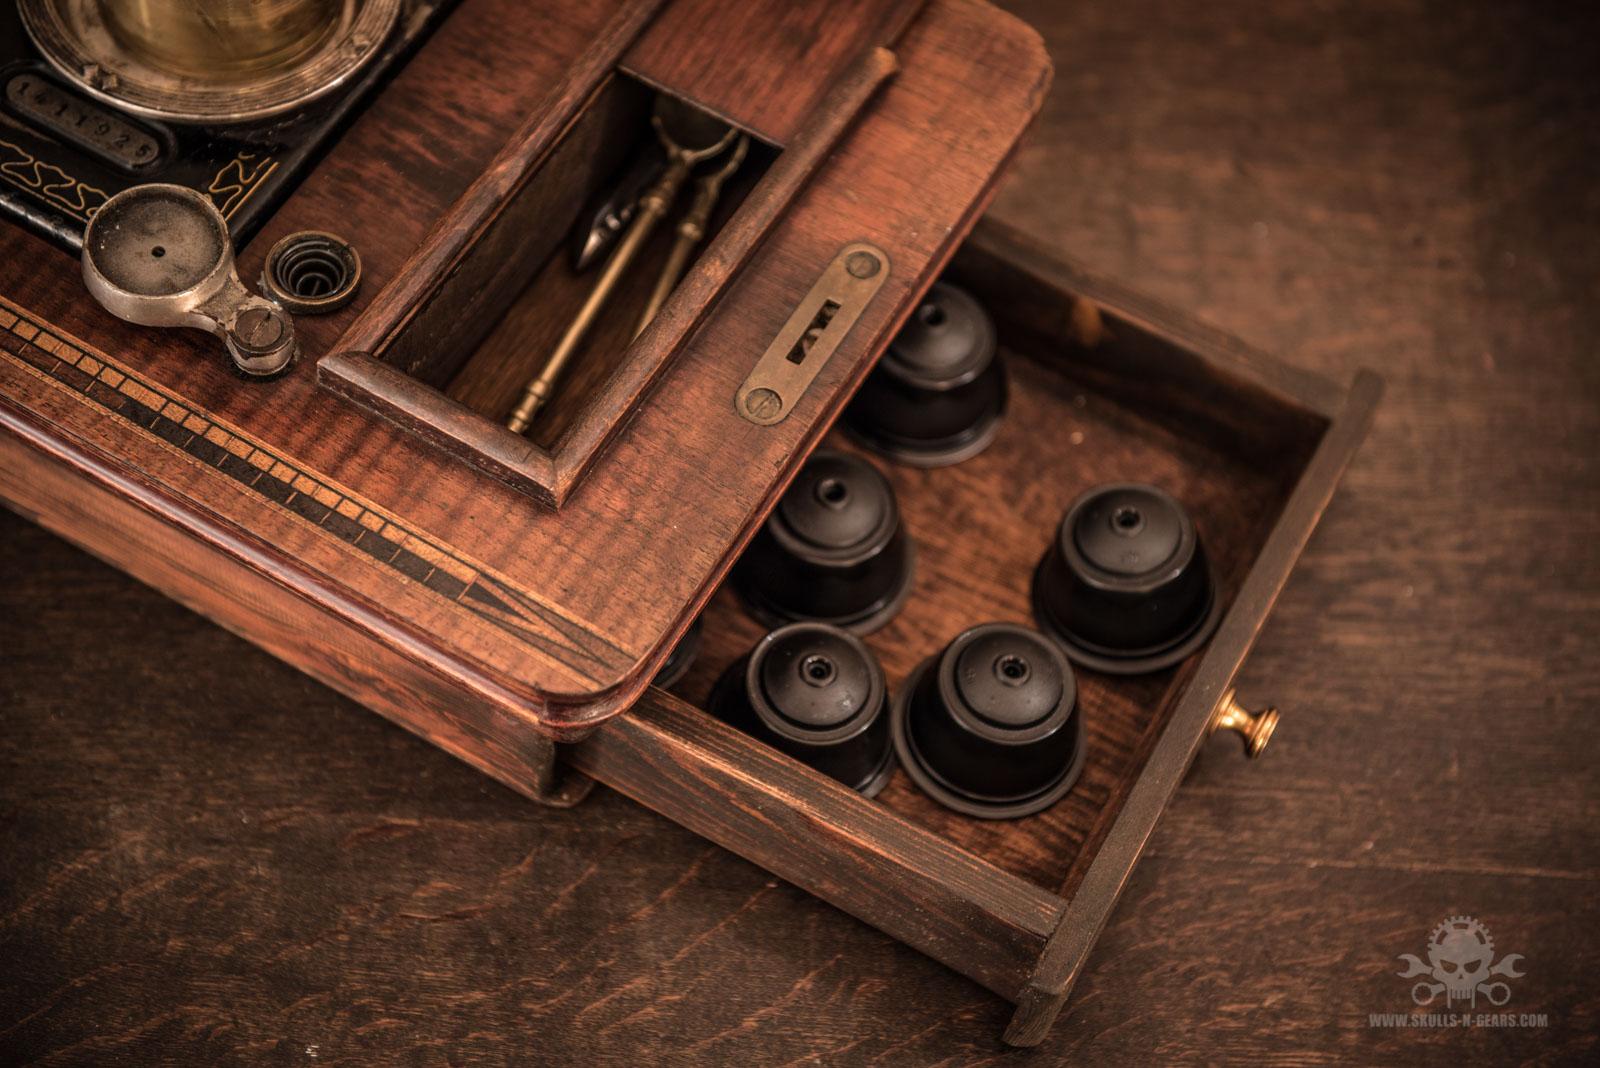 Steampunk_Coffee_Machine-9